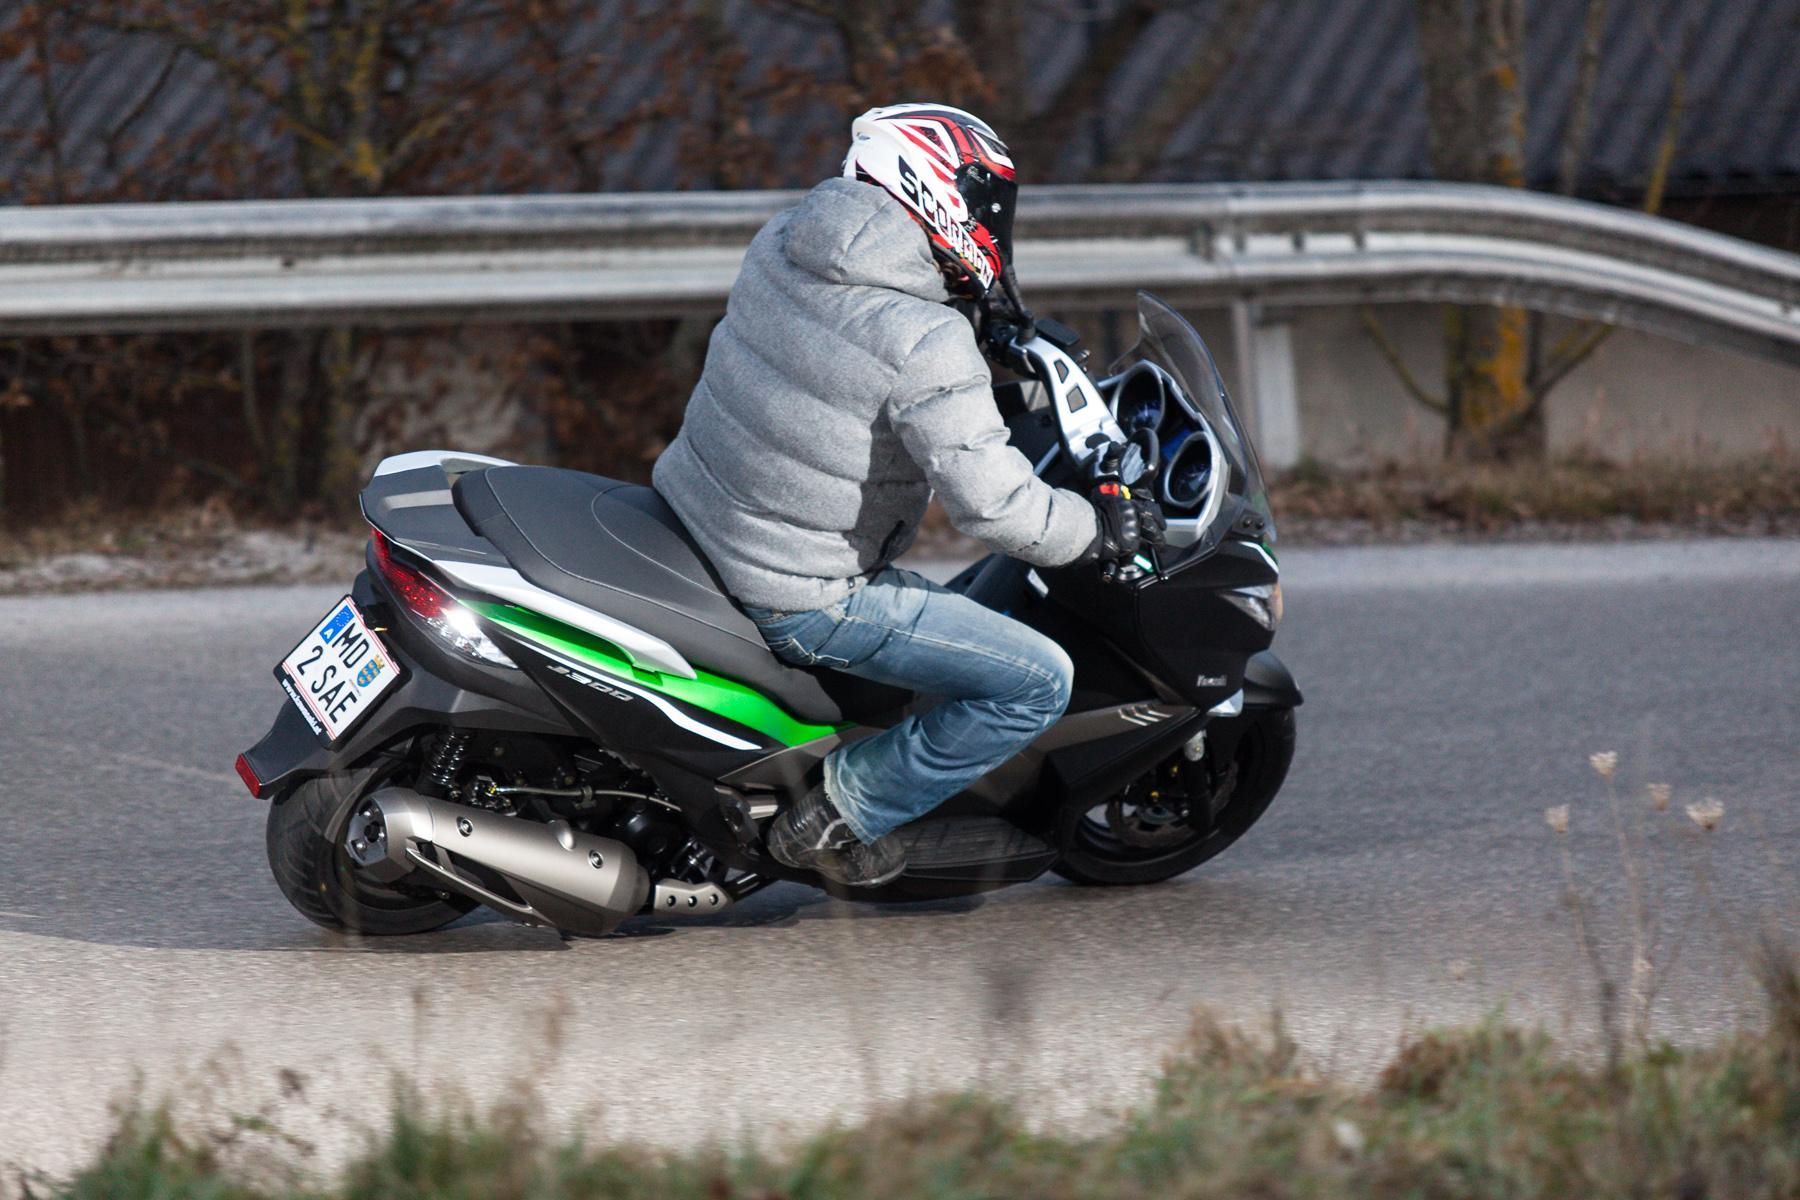 http://www.motorrad-bilder.at/slideshows/291/010647/kawasaki_j300_roller-45.jpg